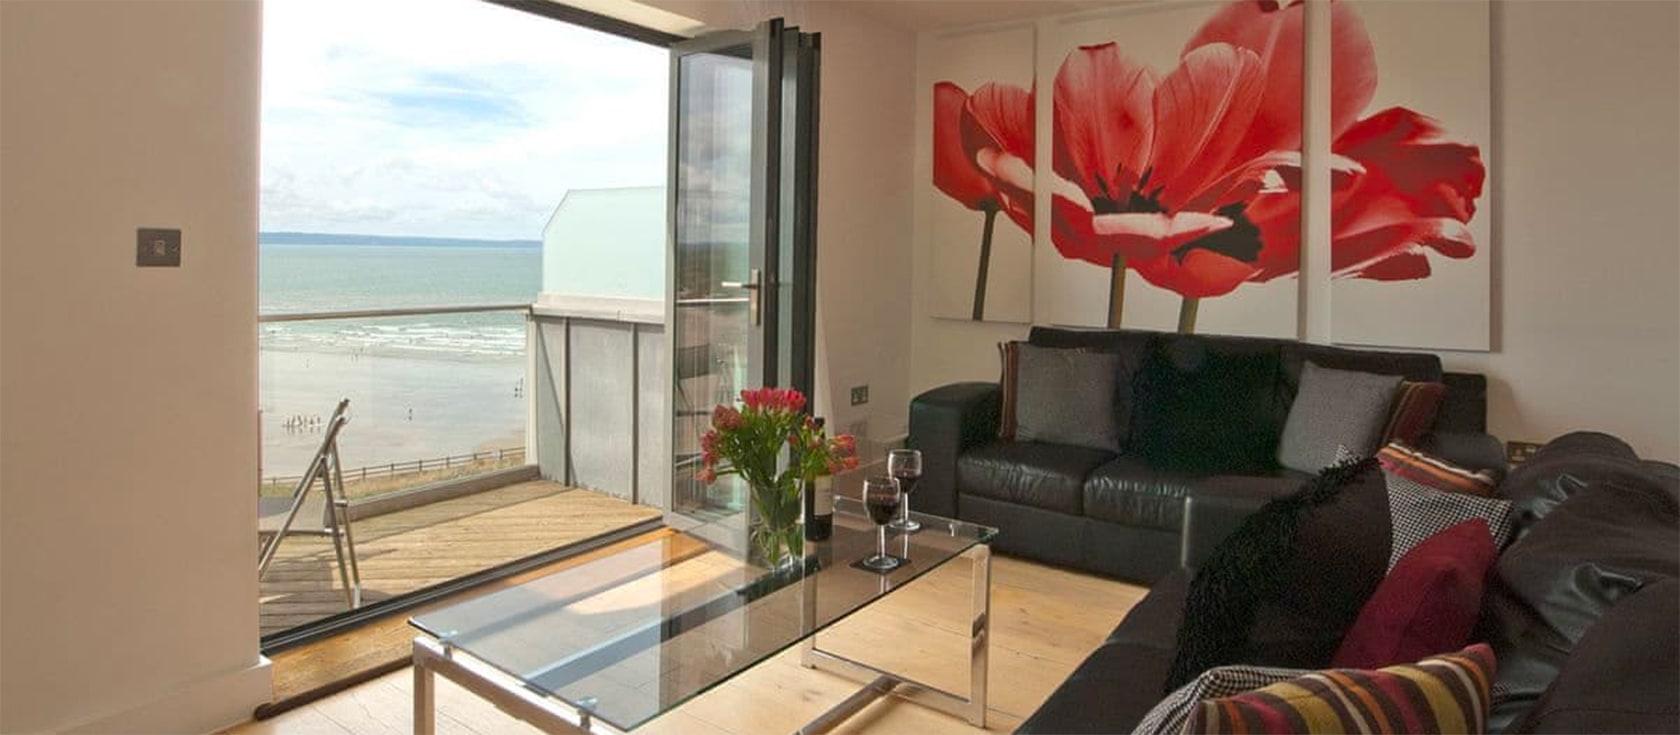 12 Ocean Point Penthouse, Saunton